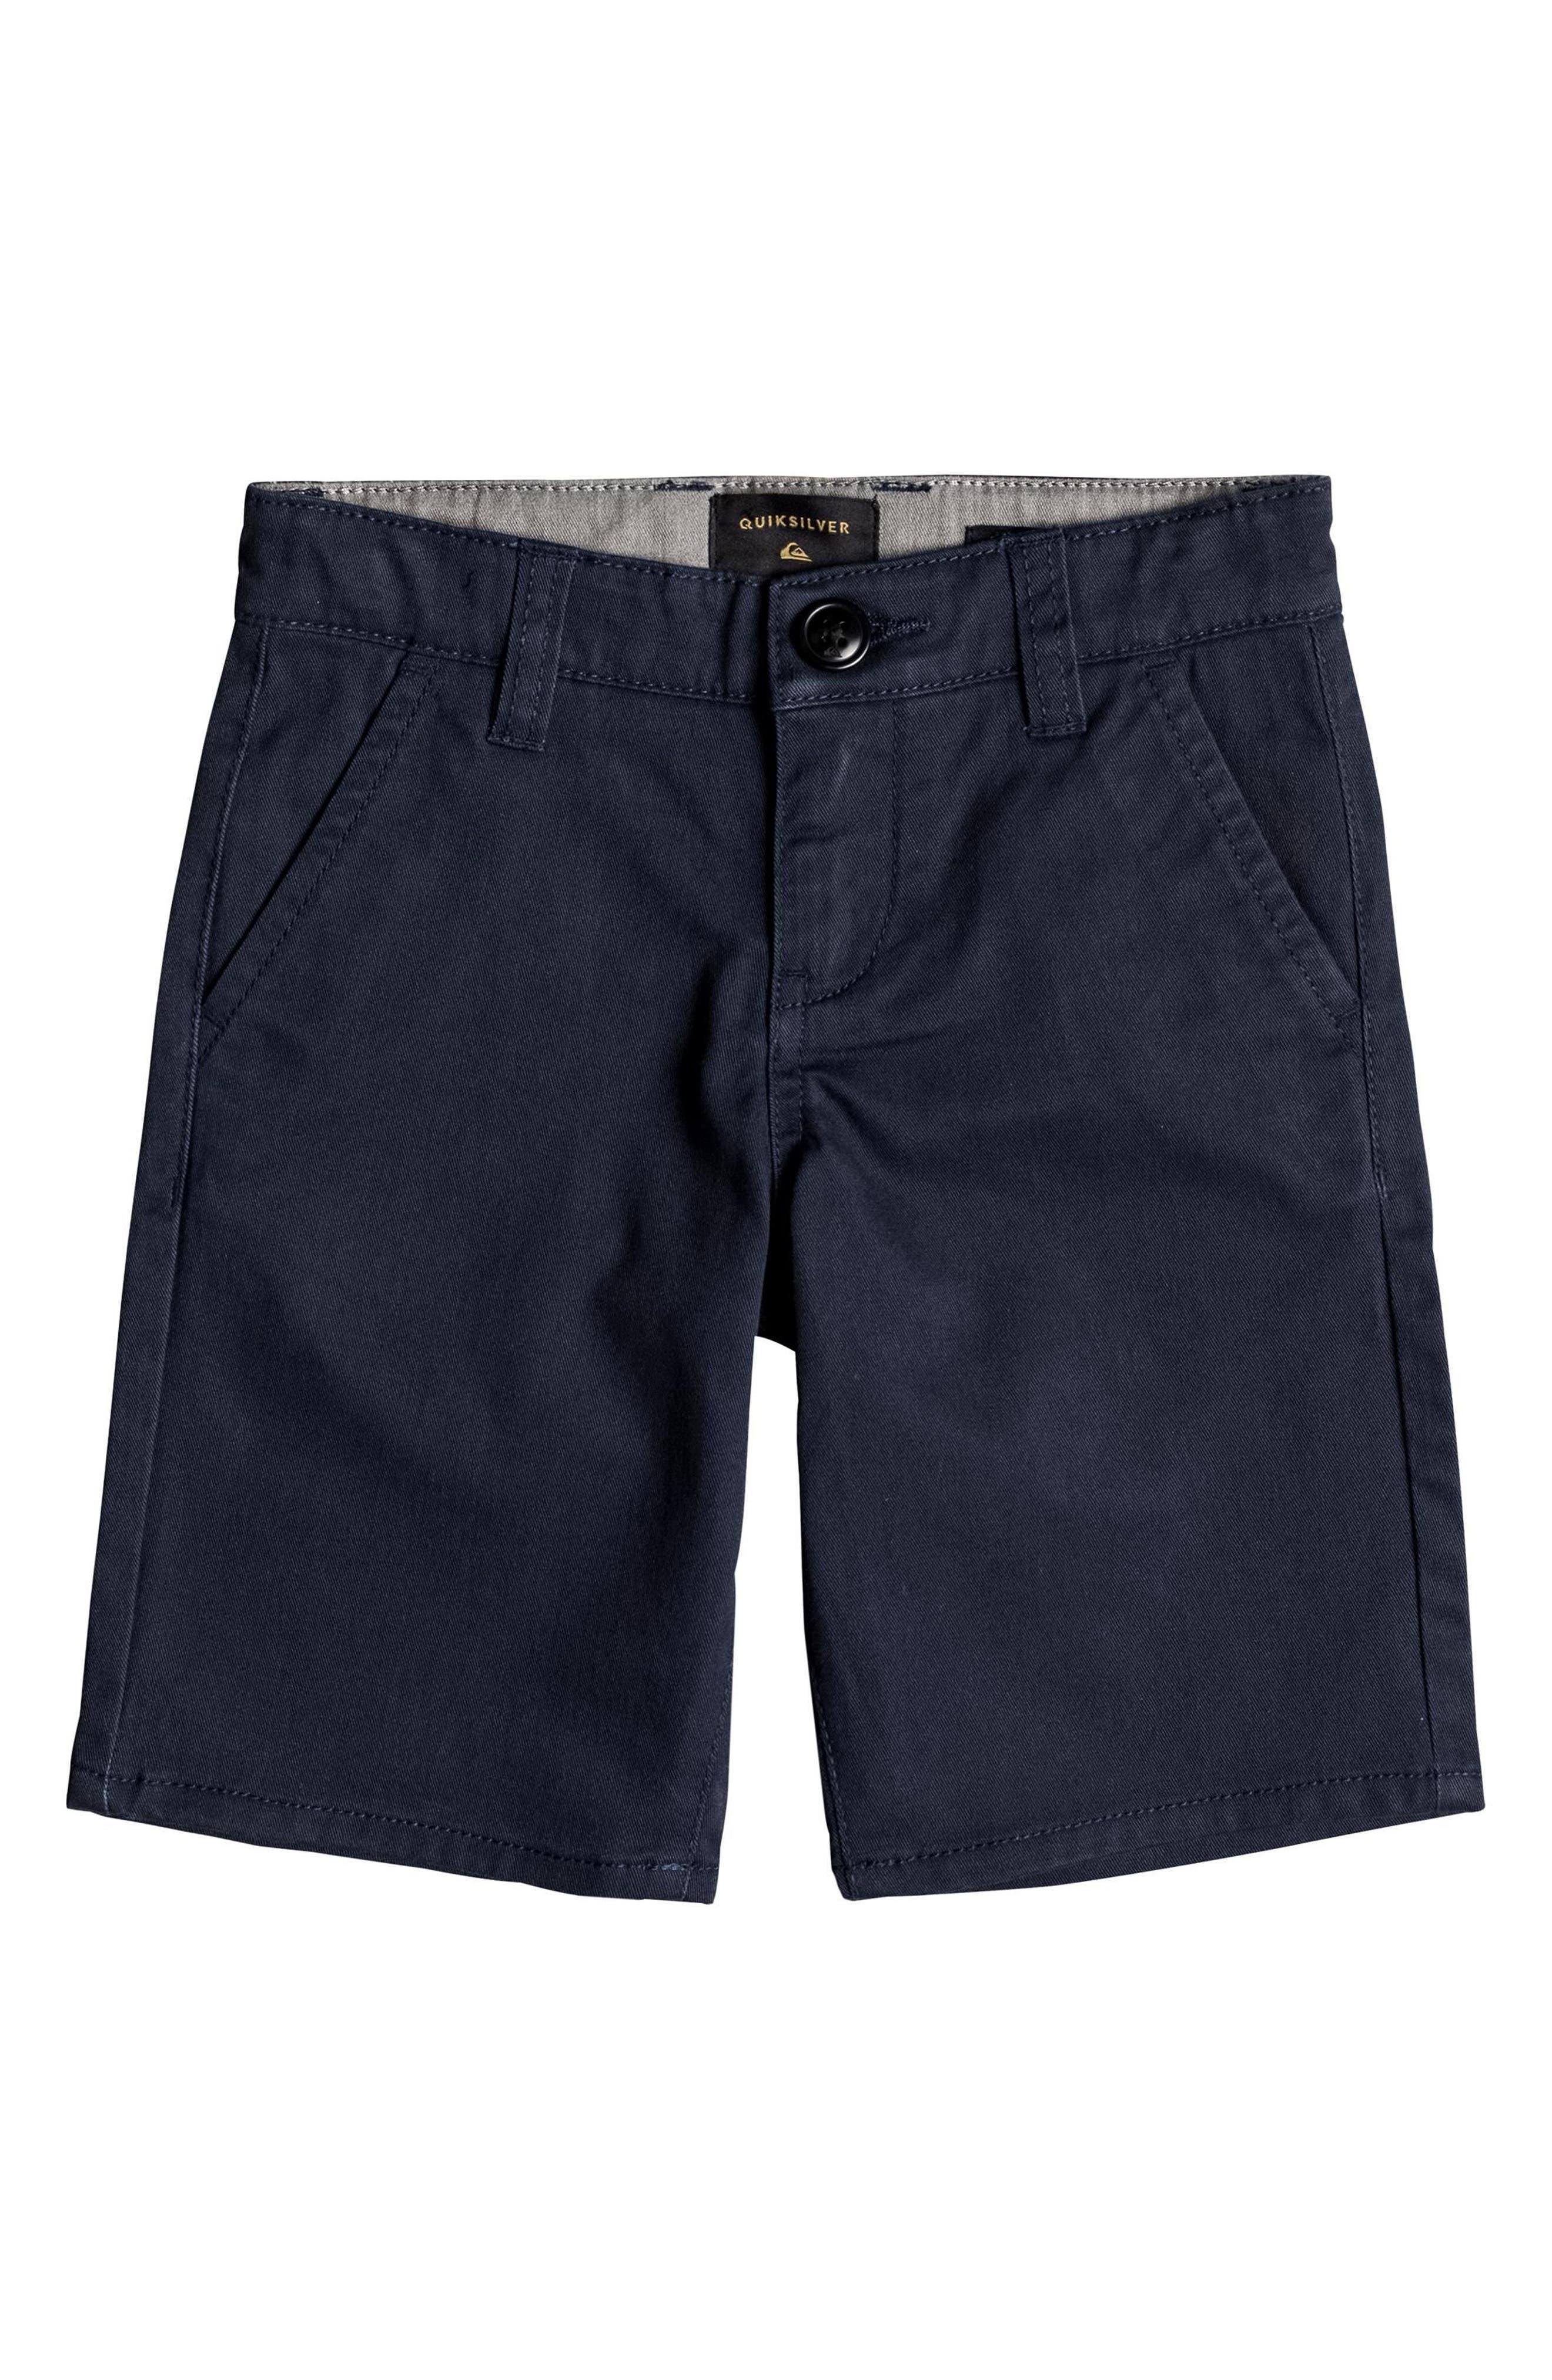 Everyday Union Stretch Shorts,                             Main thumbnail 1, color,                             Navy Blazer